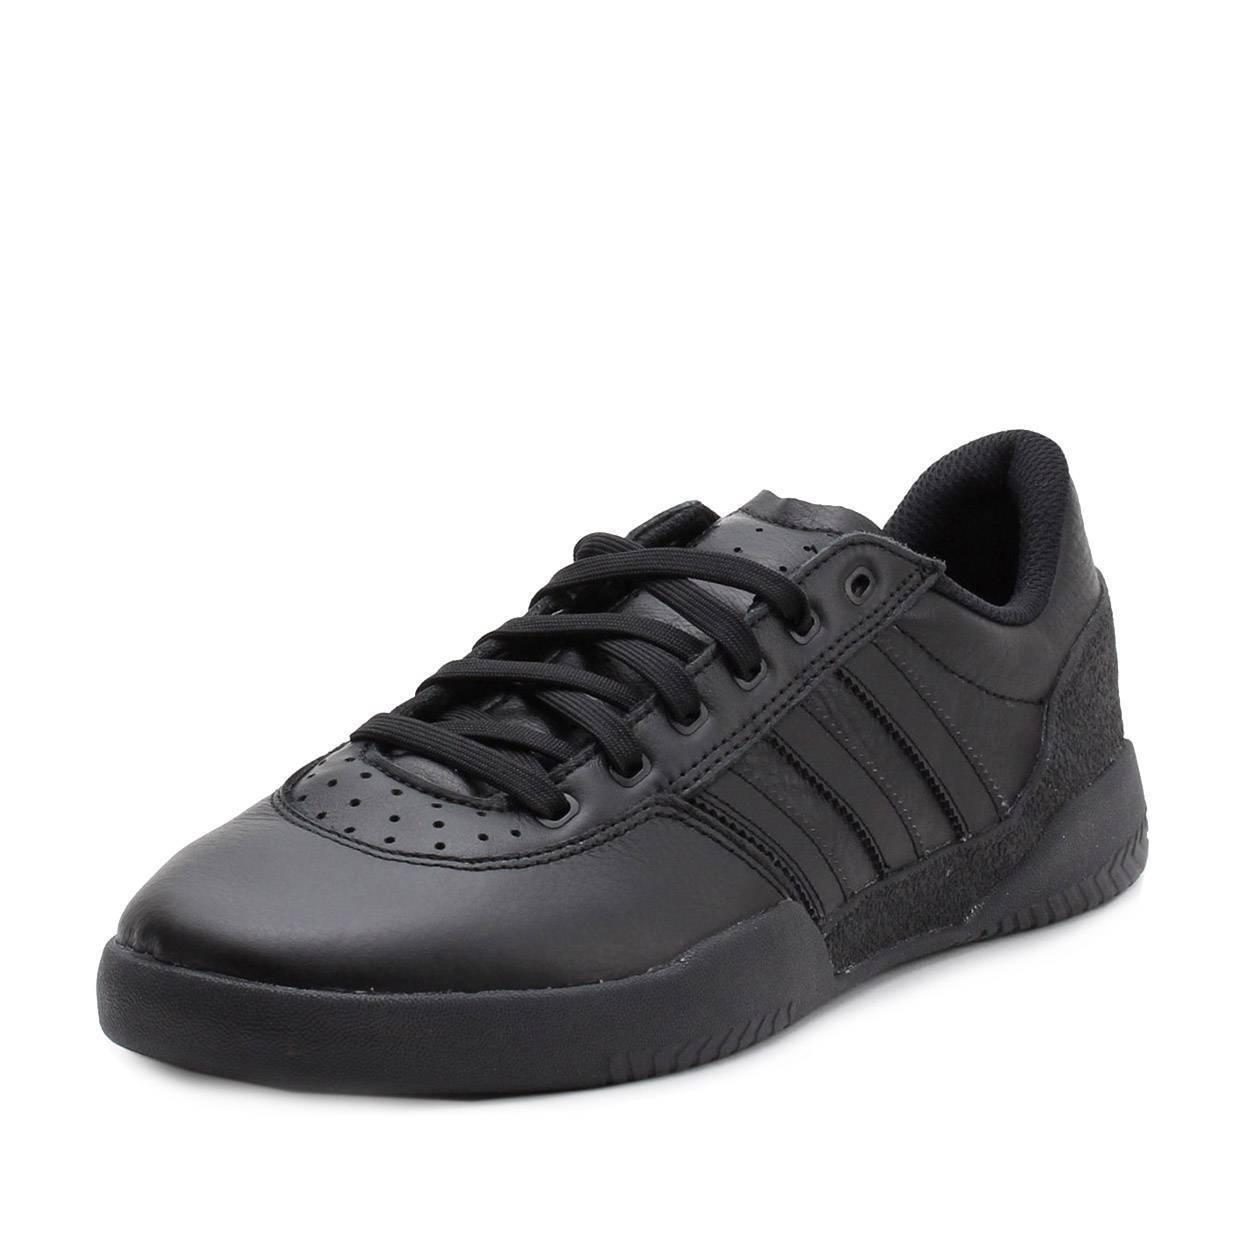 Adidas City Cup CG5636 Negro para Hombre